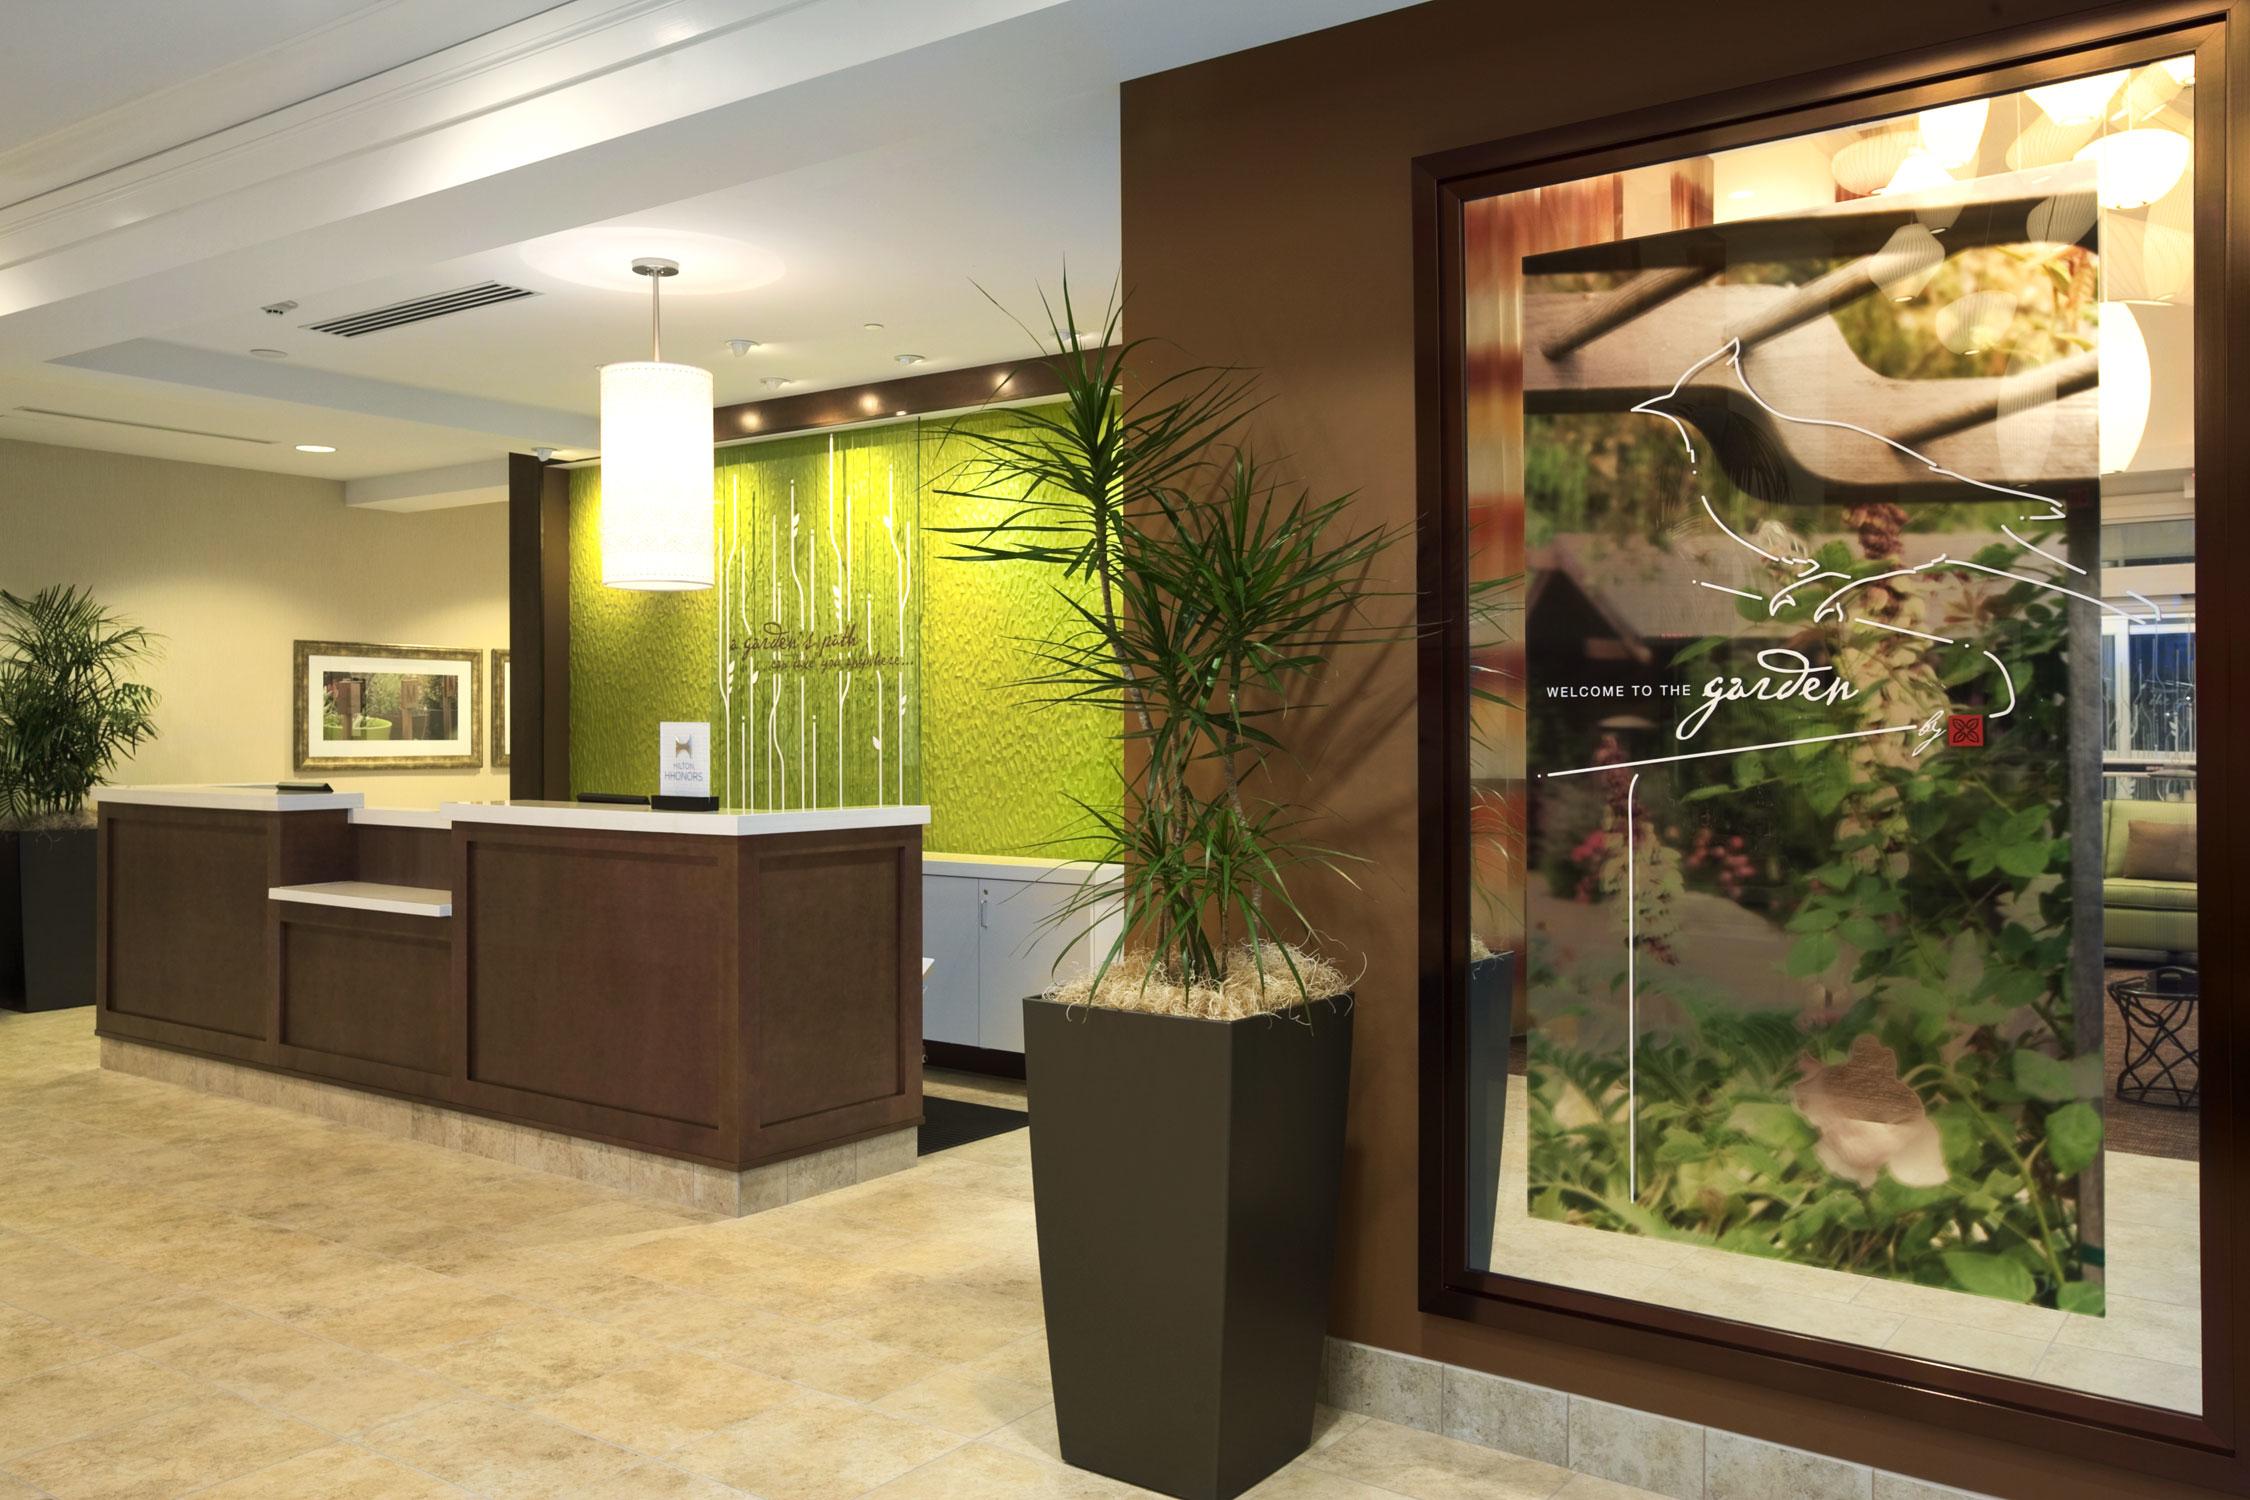 Hilton Garden Inn Salt Lake City Airport - ad image